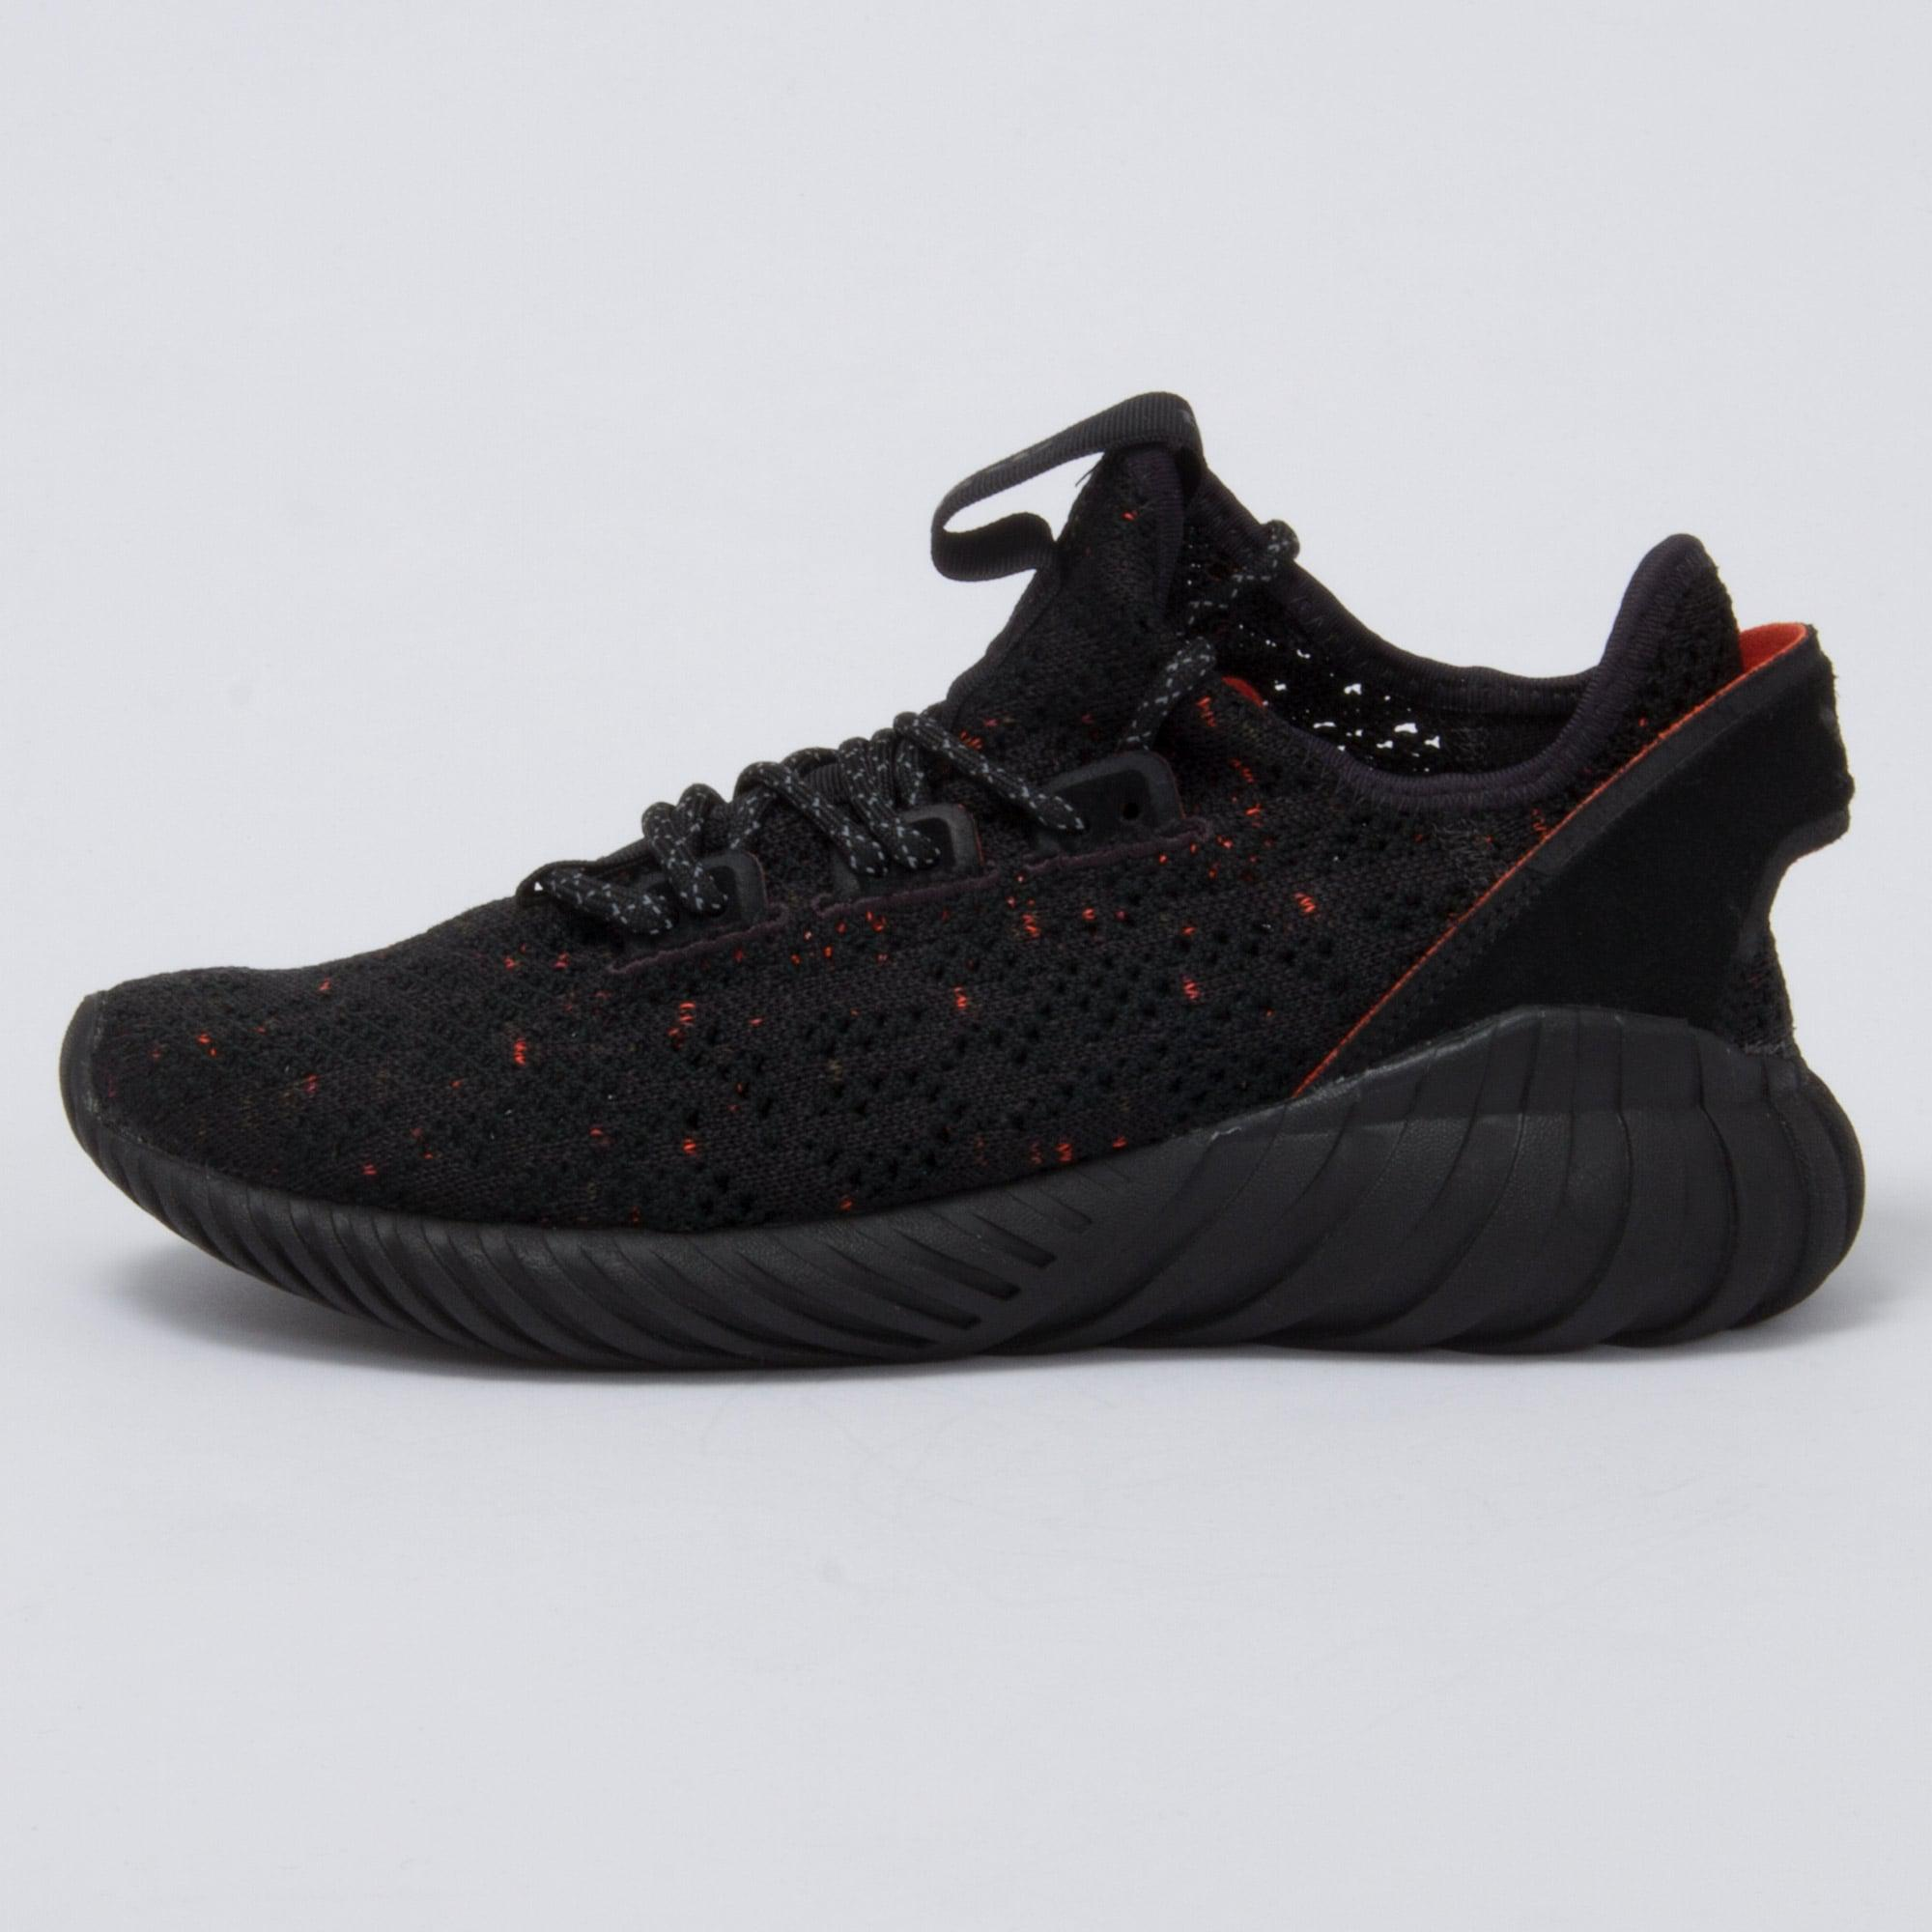 Lyst - adidas Originals Core Black Tubular Doom Sock Primeknit in ... 25fedf9afc8f